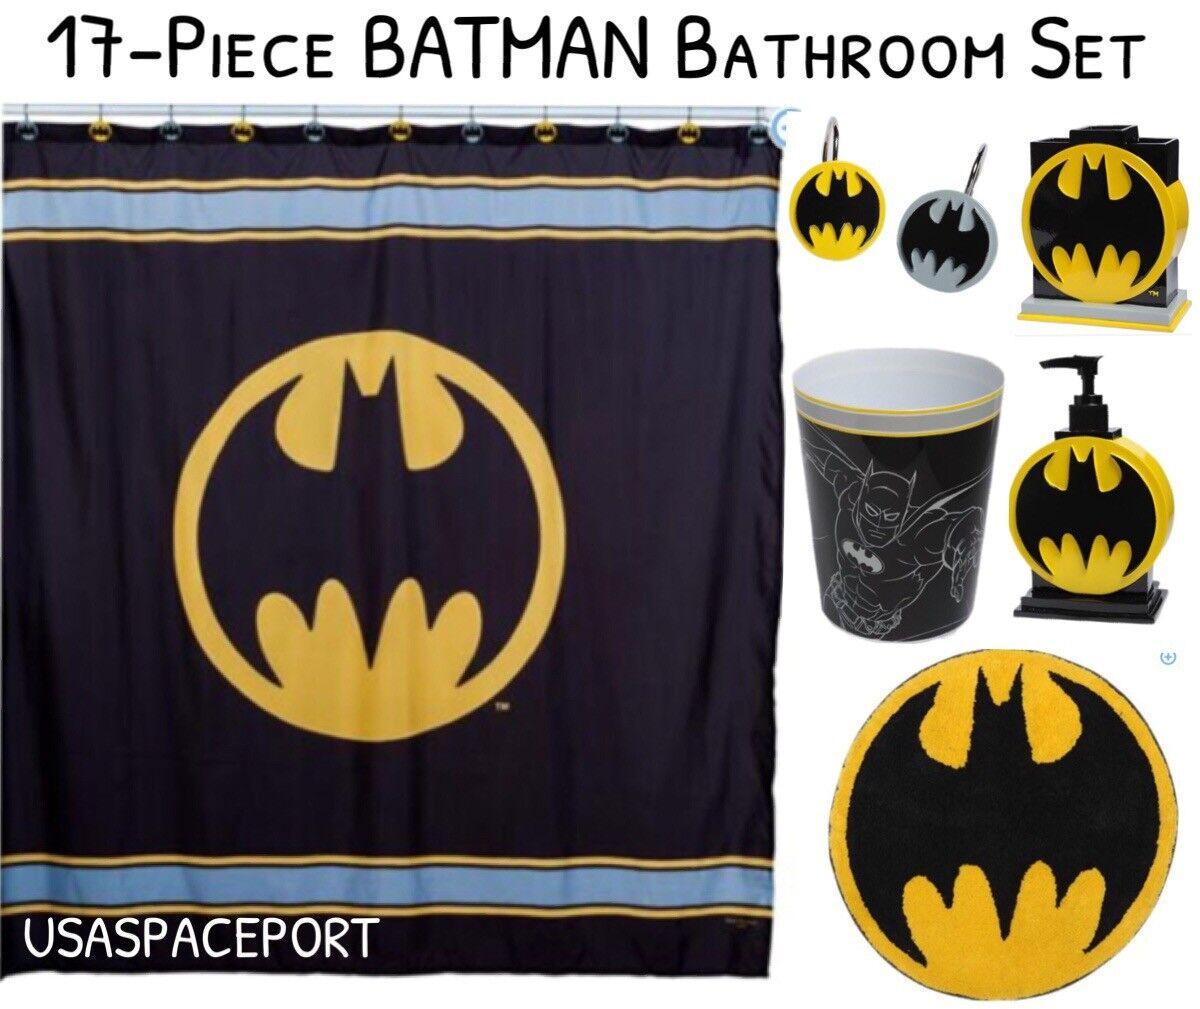 17pc BATMAN BATH SET Shower Curtain+Hooks+Rug+Pump+Toothbrush Holder+Wastebasket